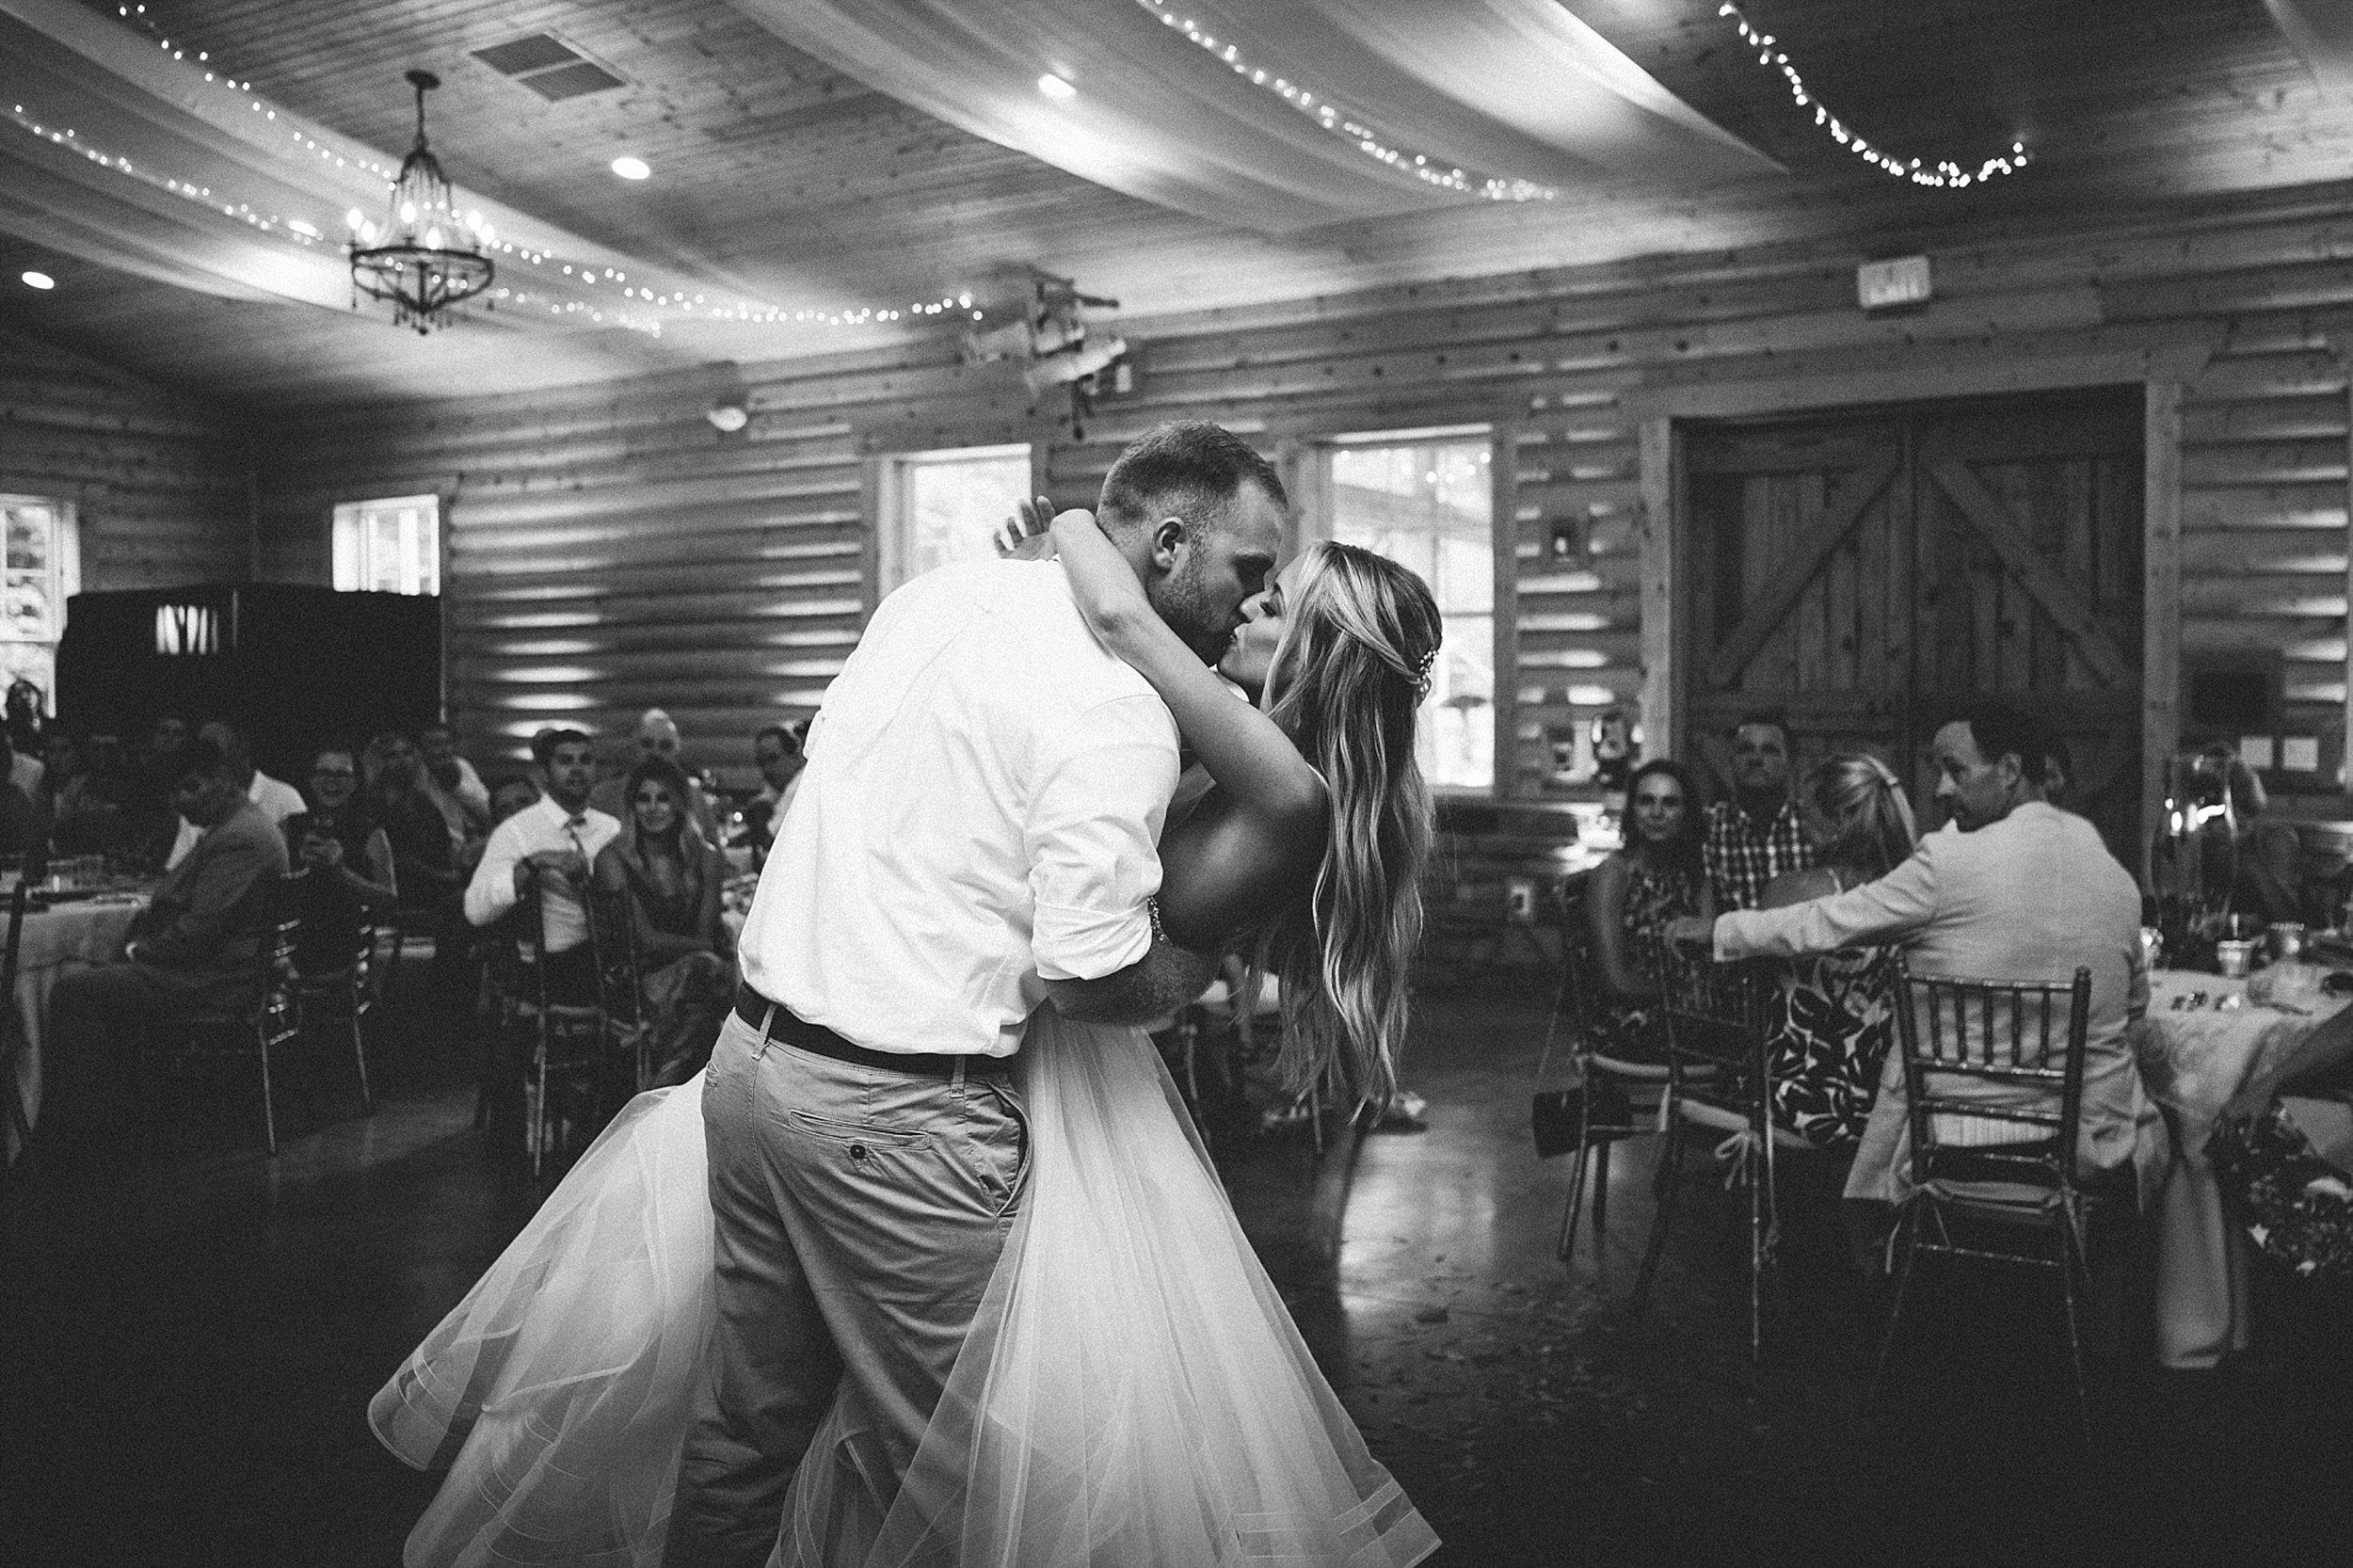 Brooke Townsend Photography - Cincinnati Wedding Photographer (133 of 153).jpg